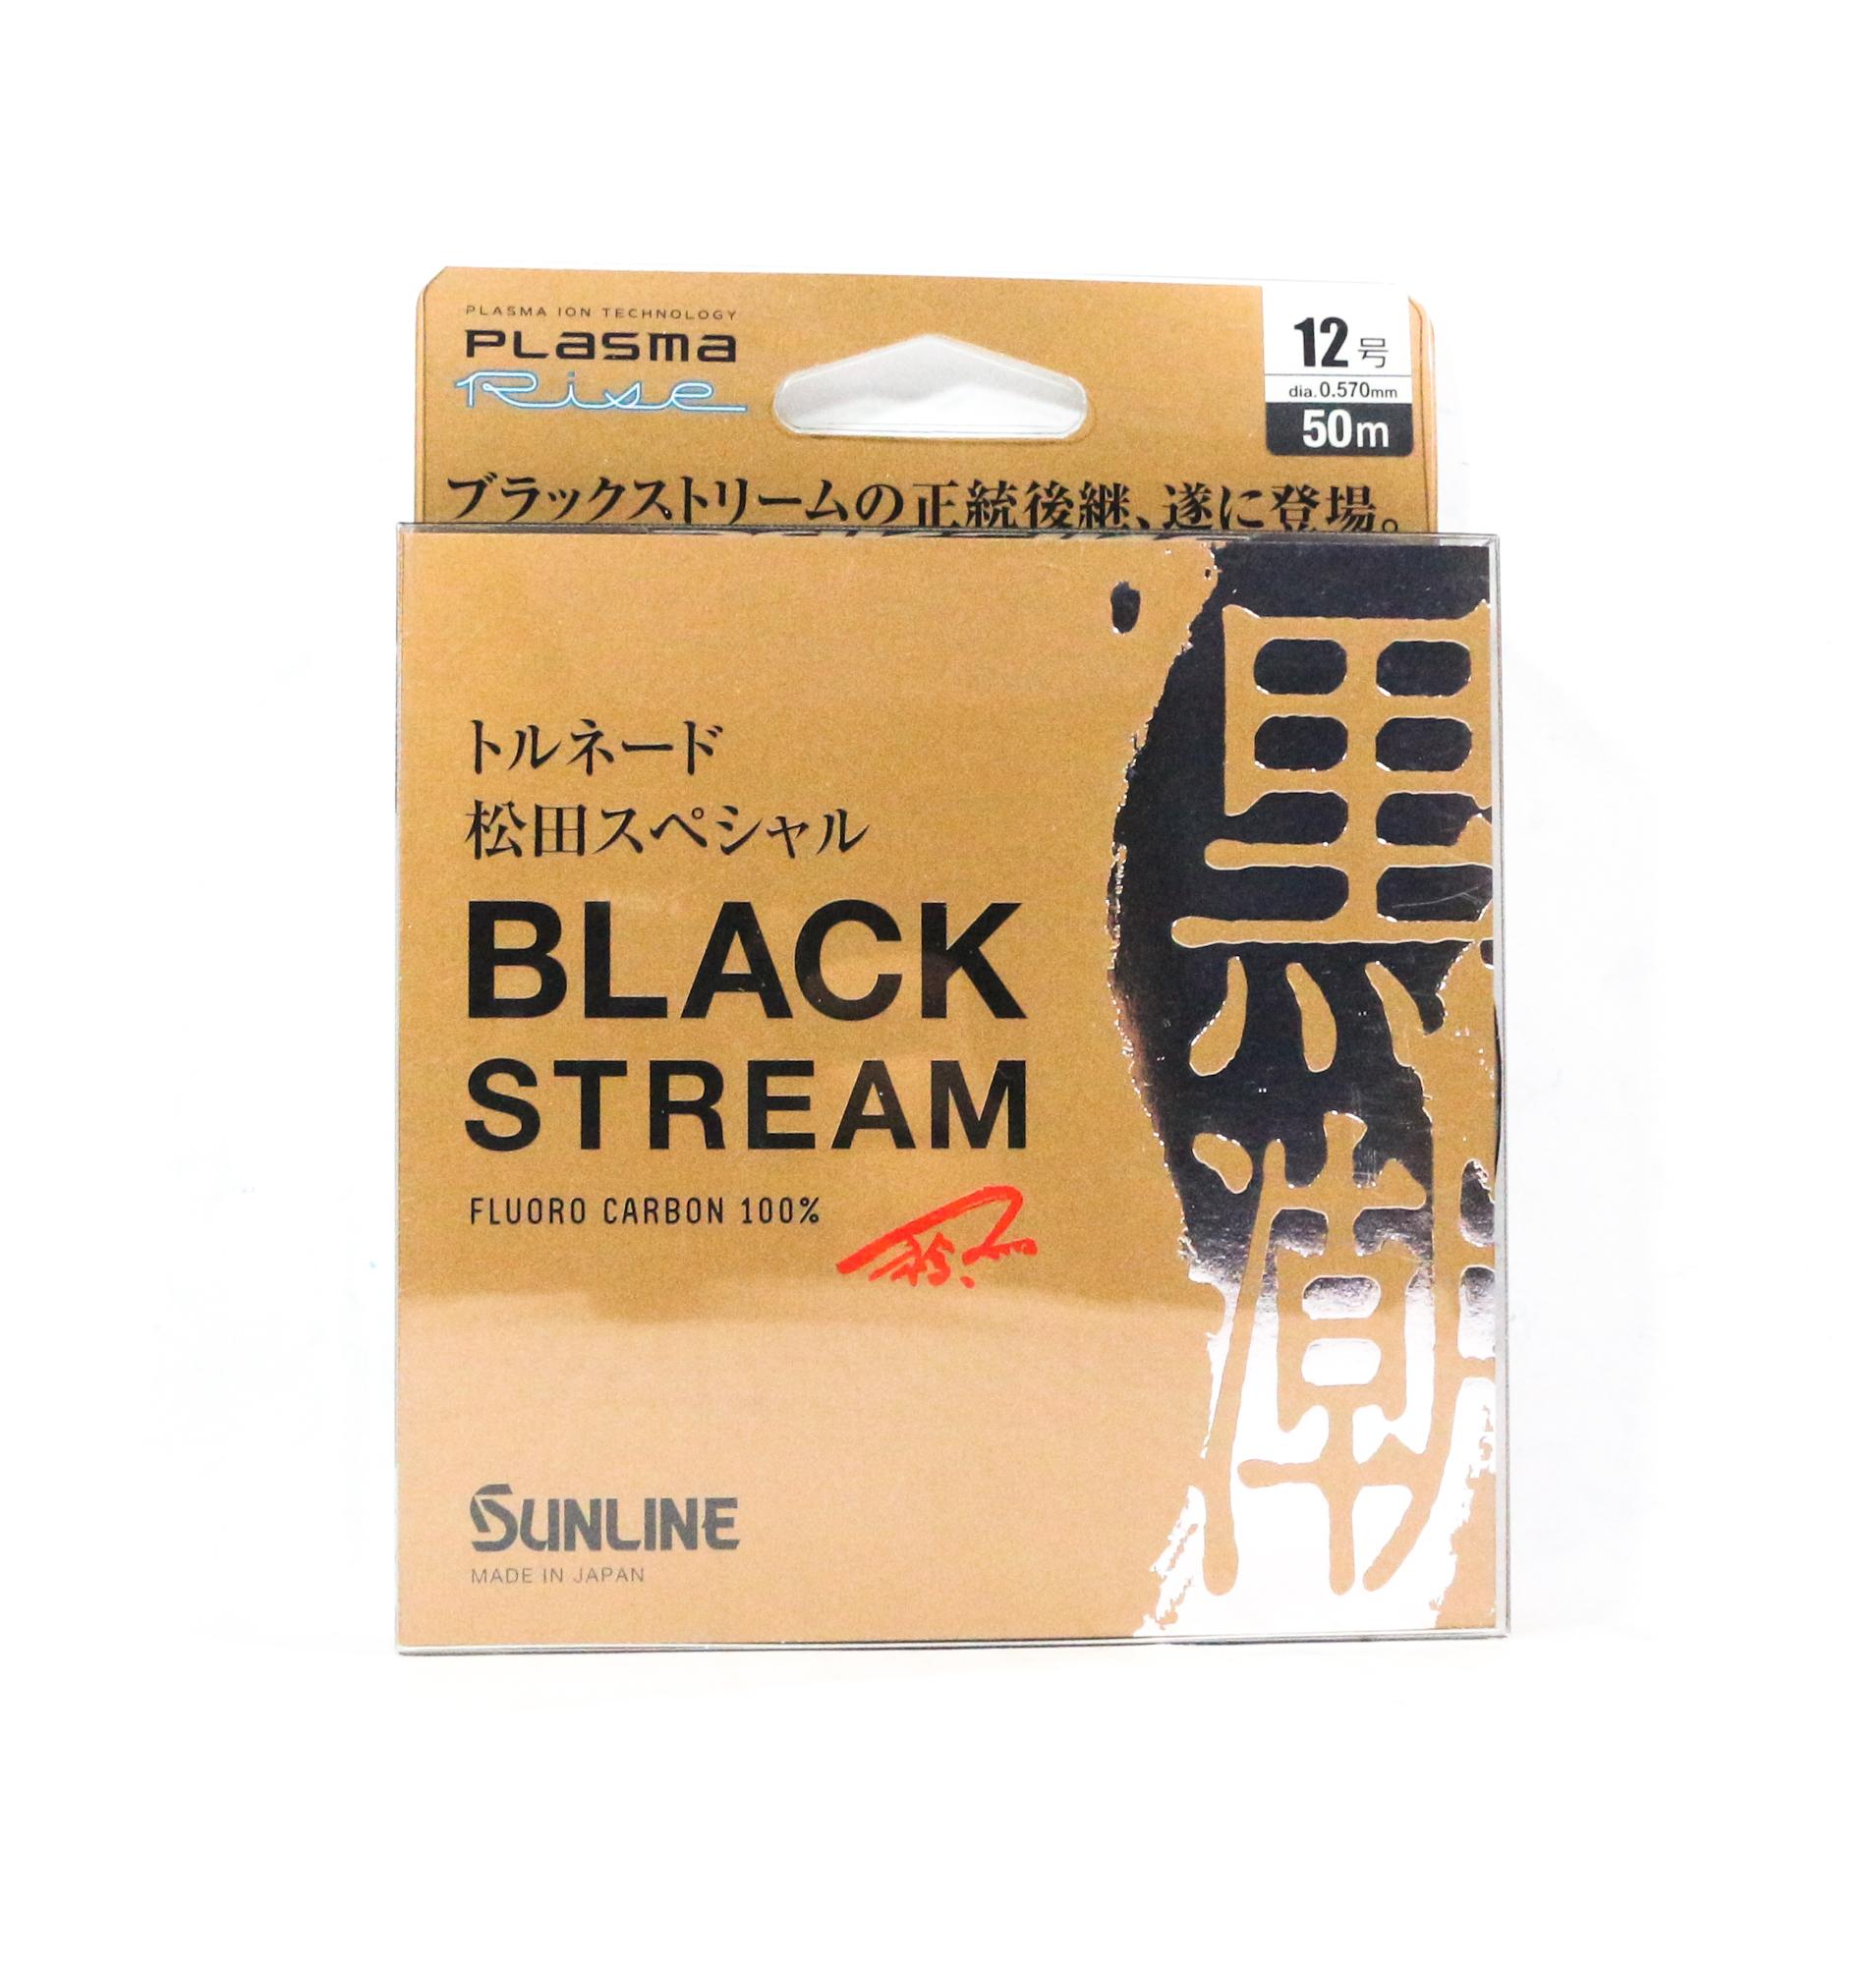 Sunline Fluorocarbon Leader Black Stream Plasma 50m Size 12 0.57mm 40lb (0822)